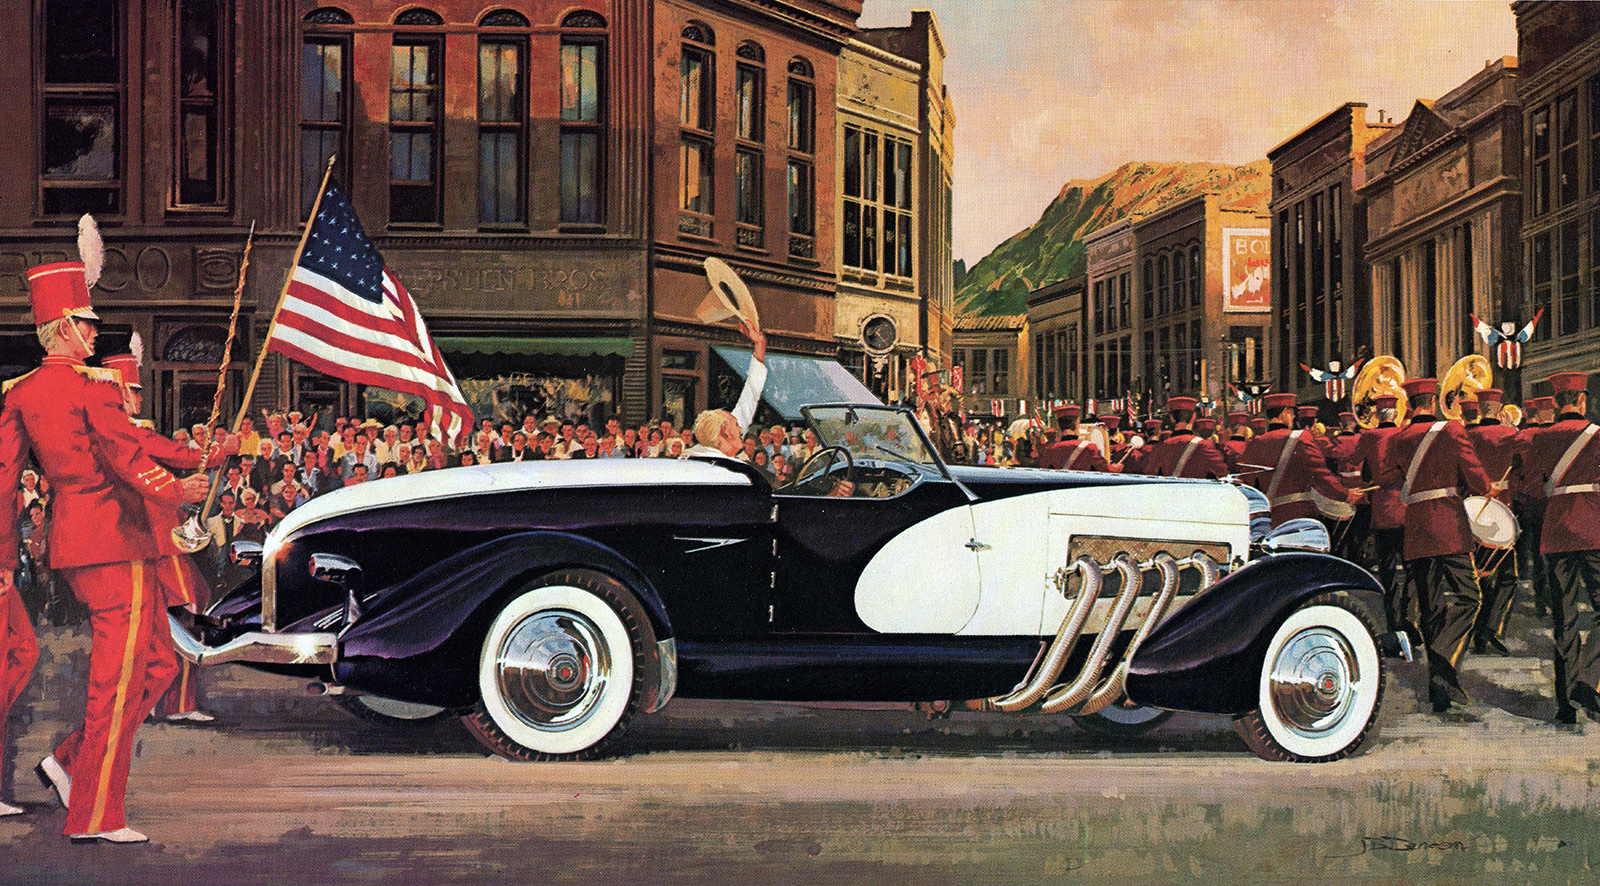 1933. Duesenberg SJ Speedster. Illustrated by James B. Deneen